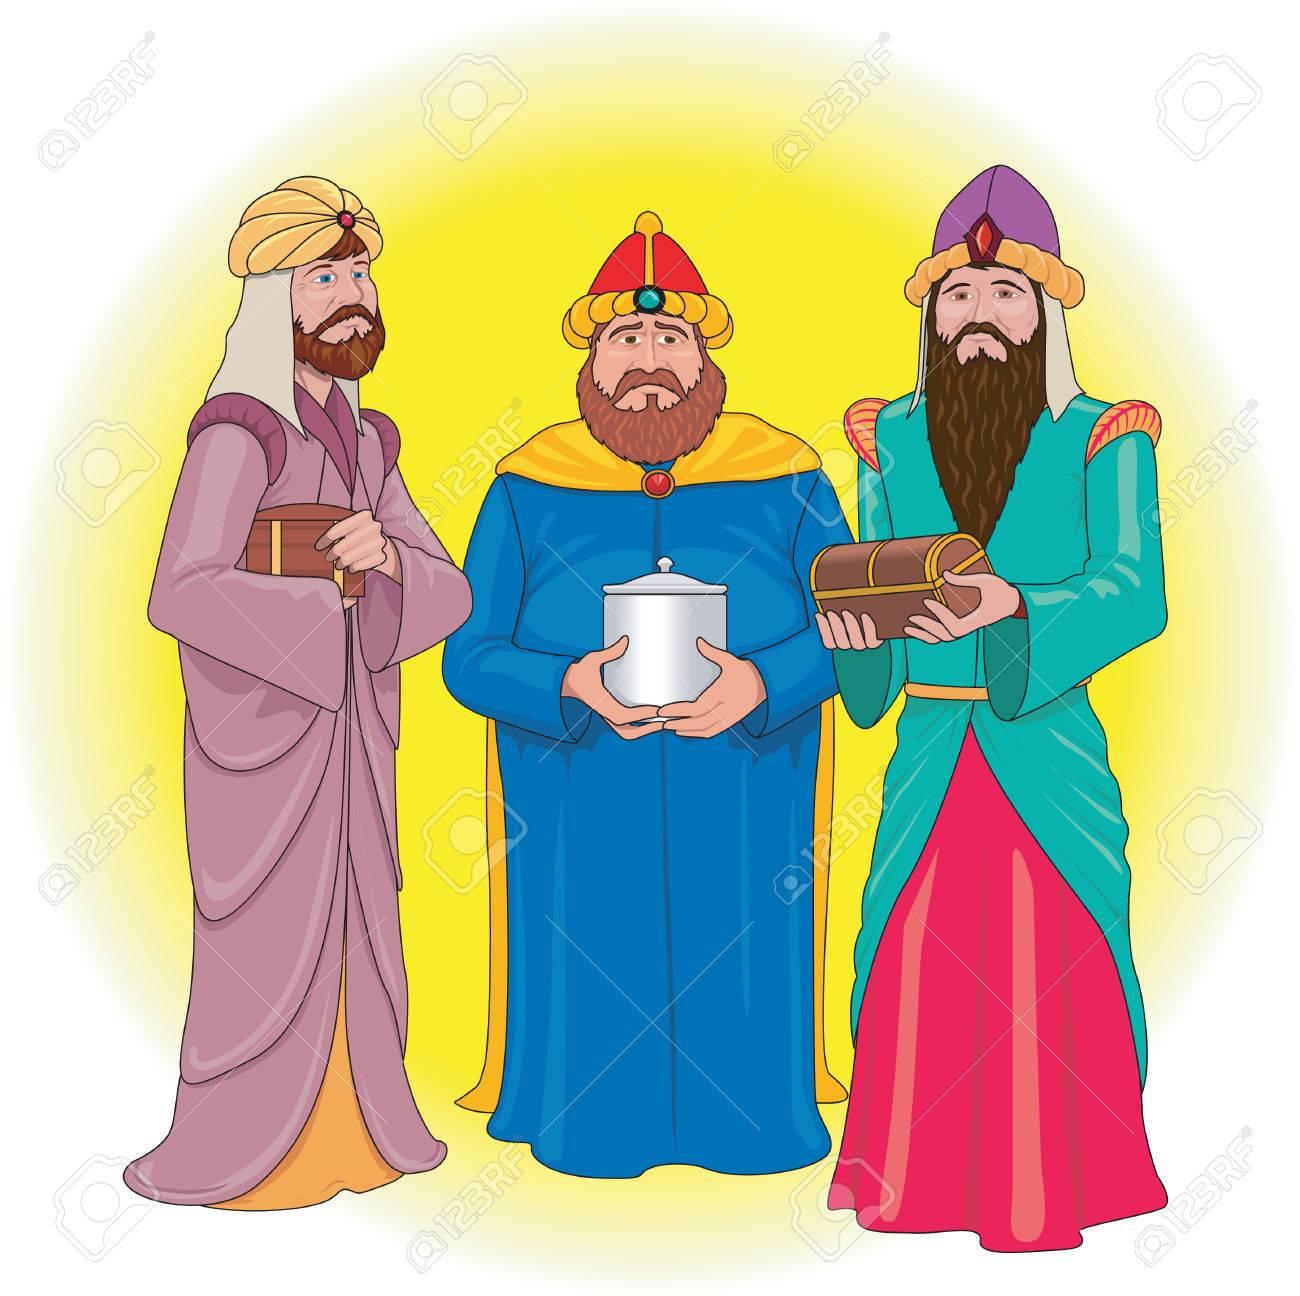 Three Wise Men Illustration.